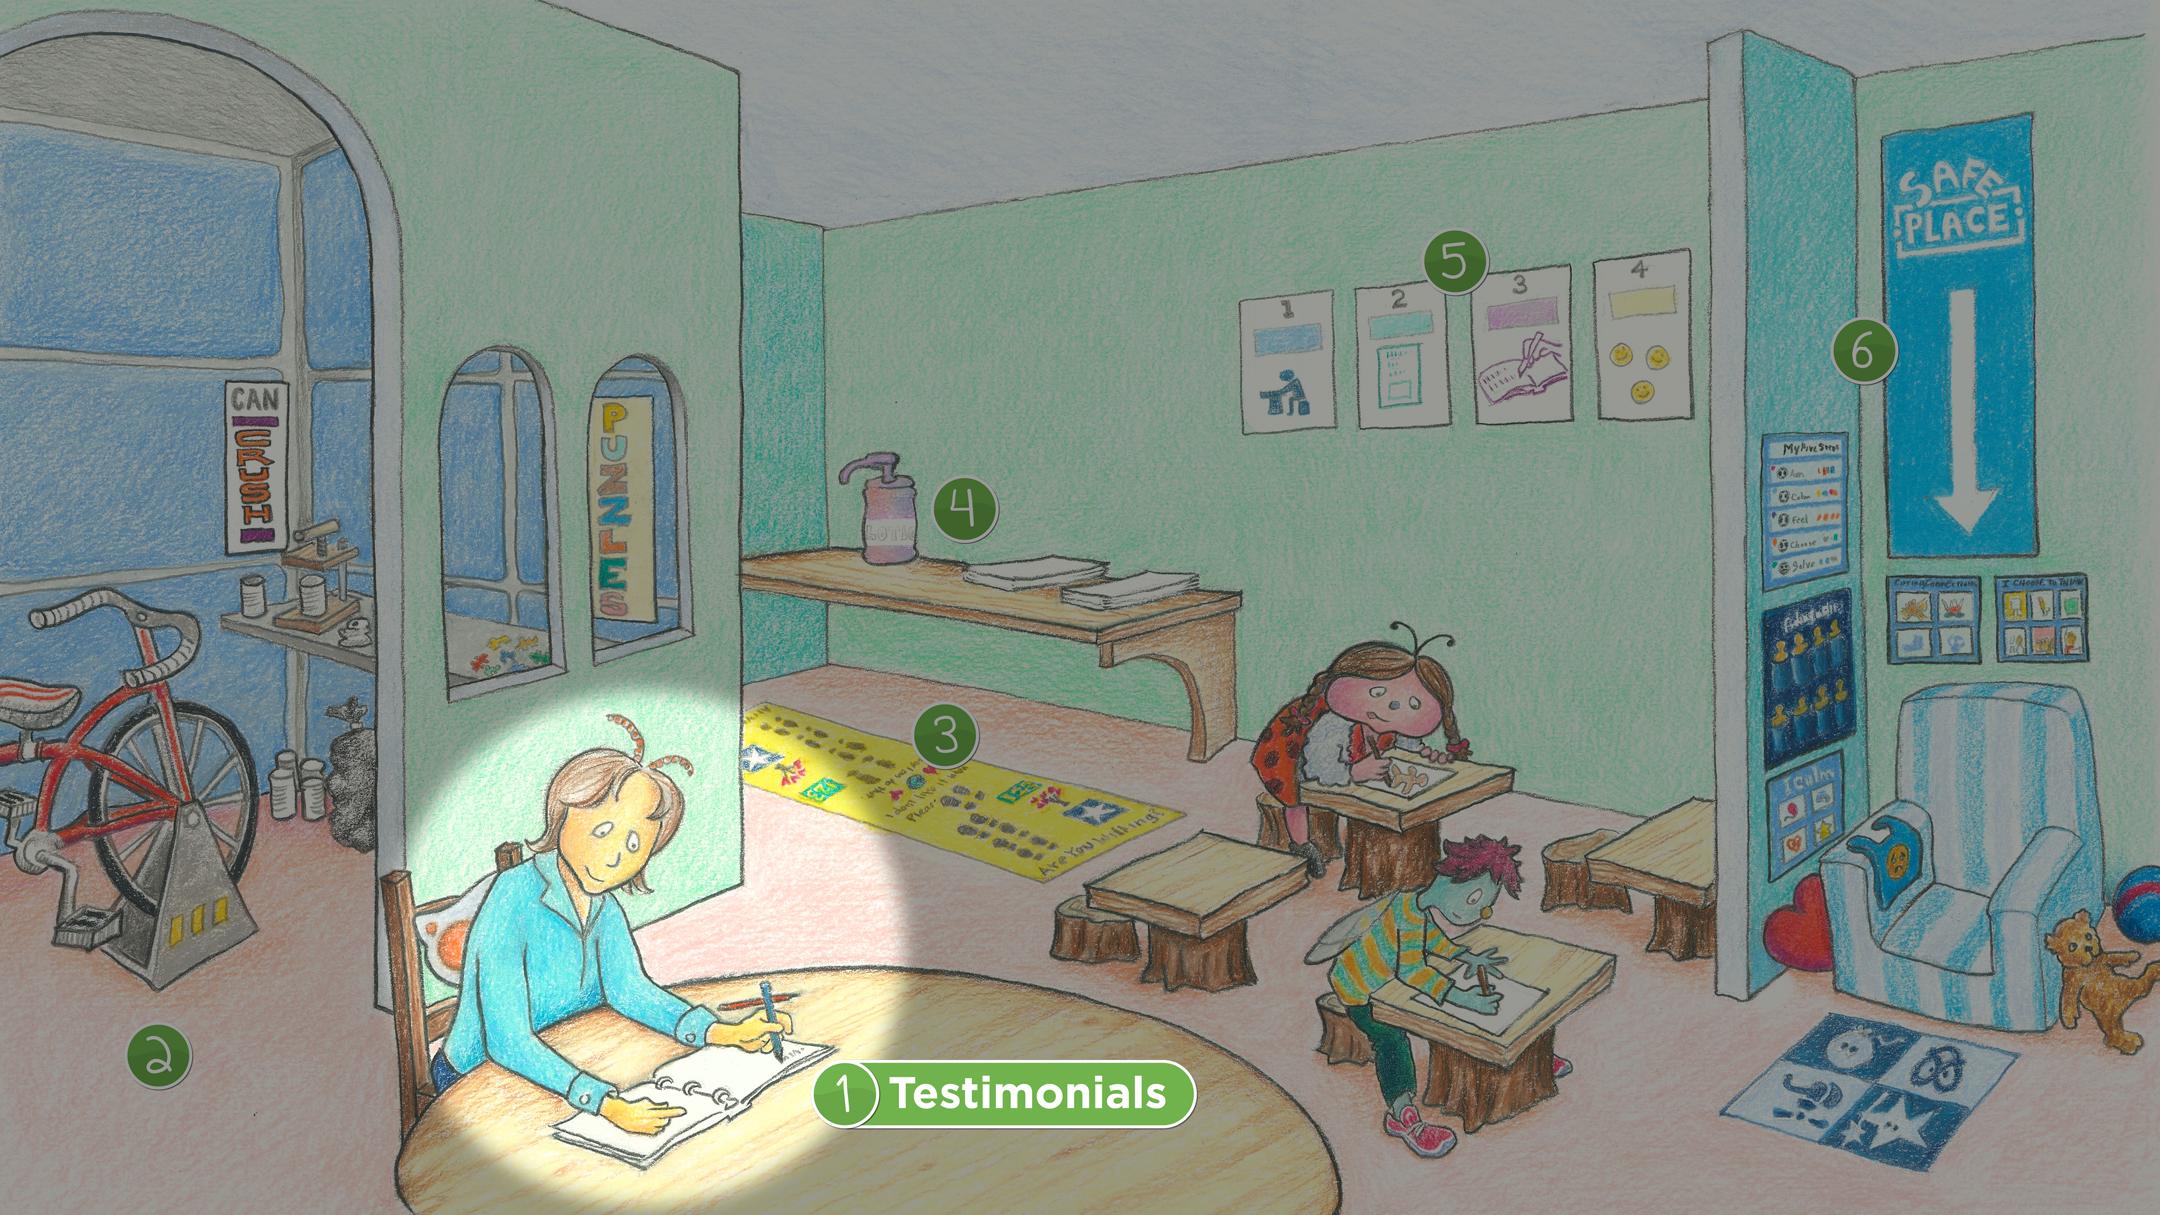 ISS Room: Testimonials